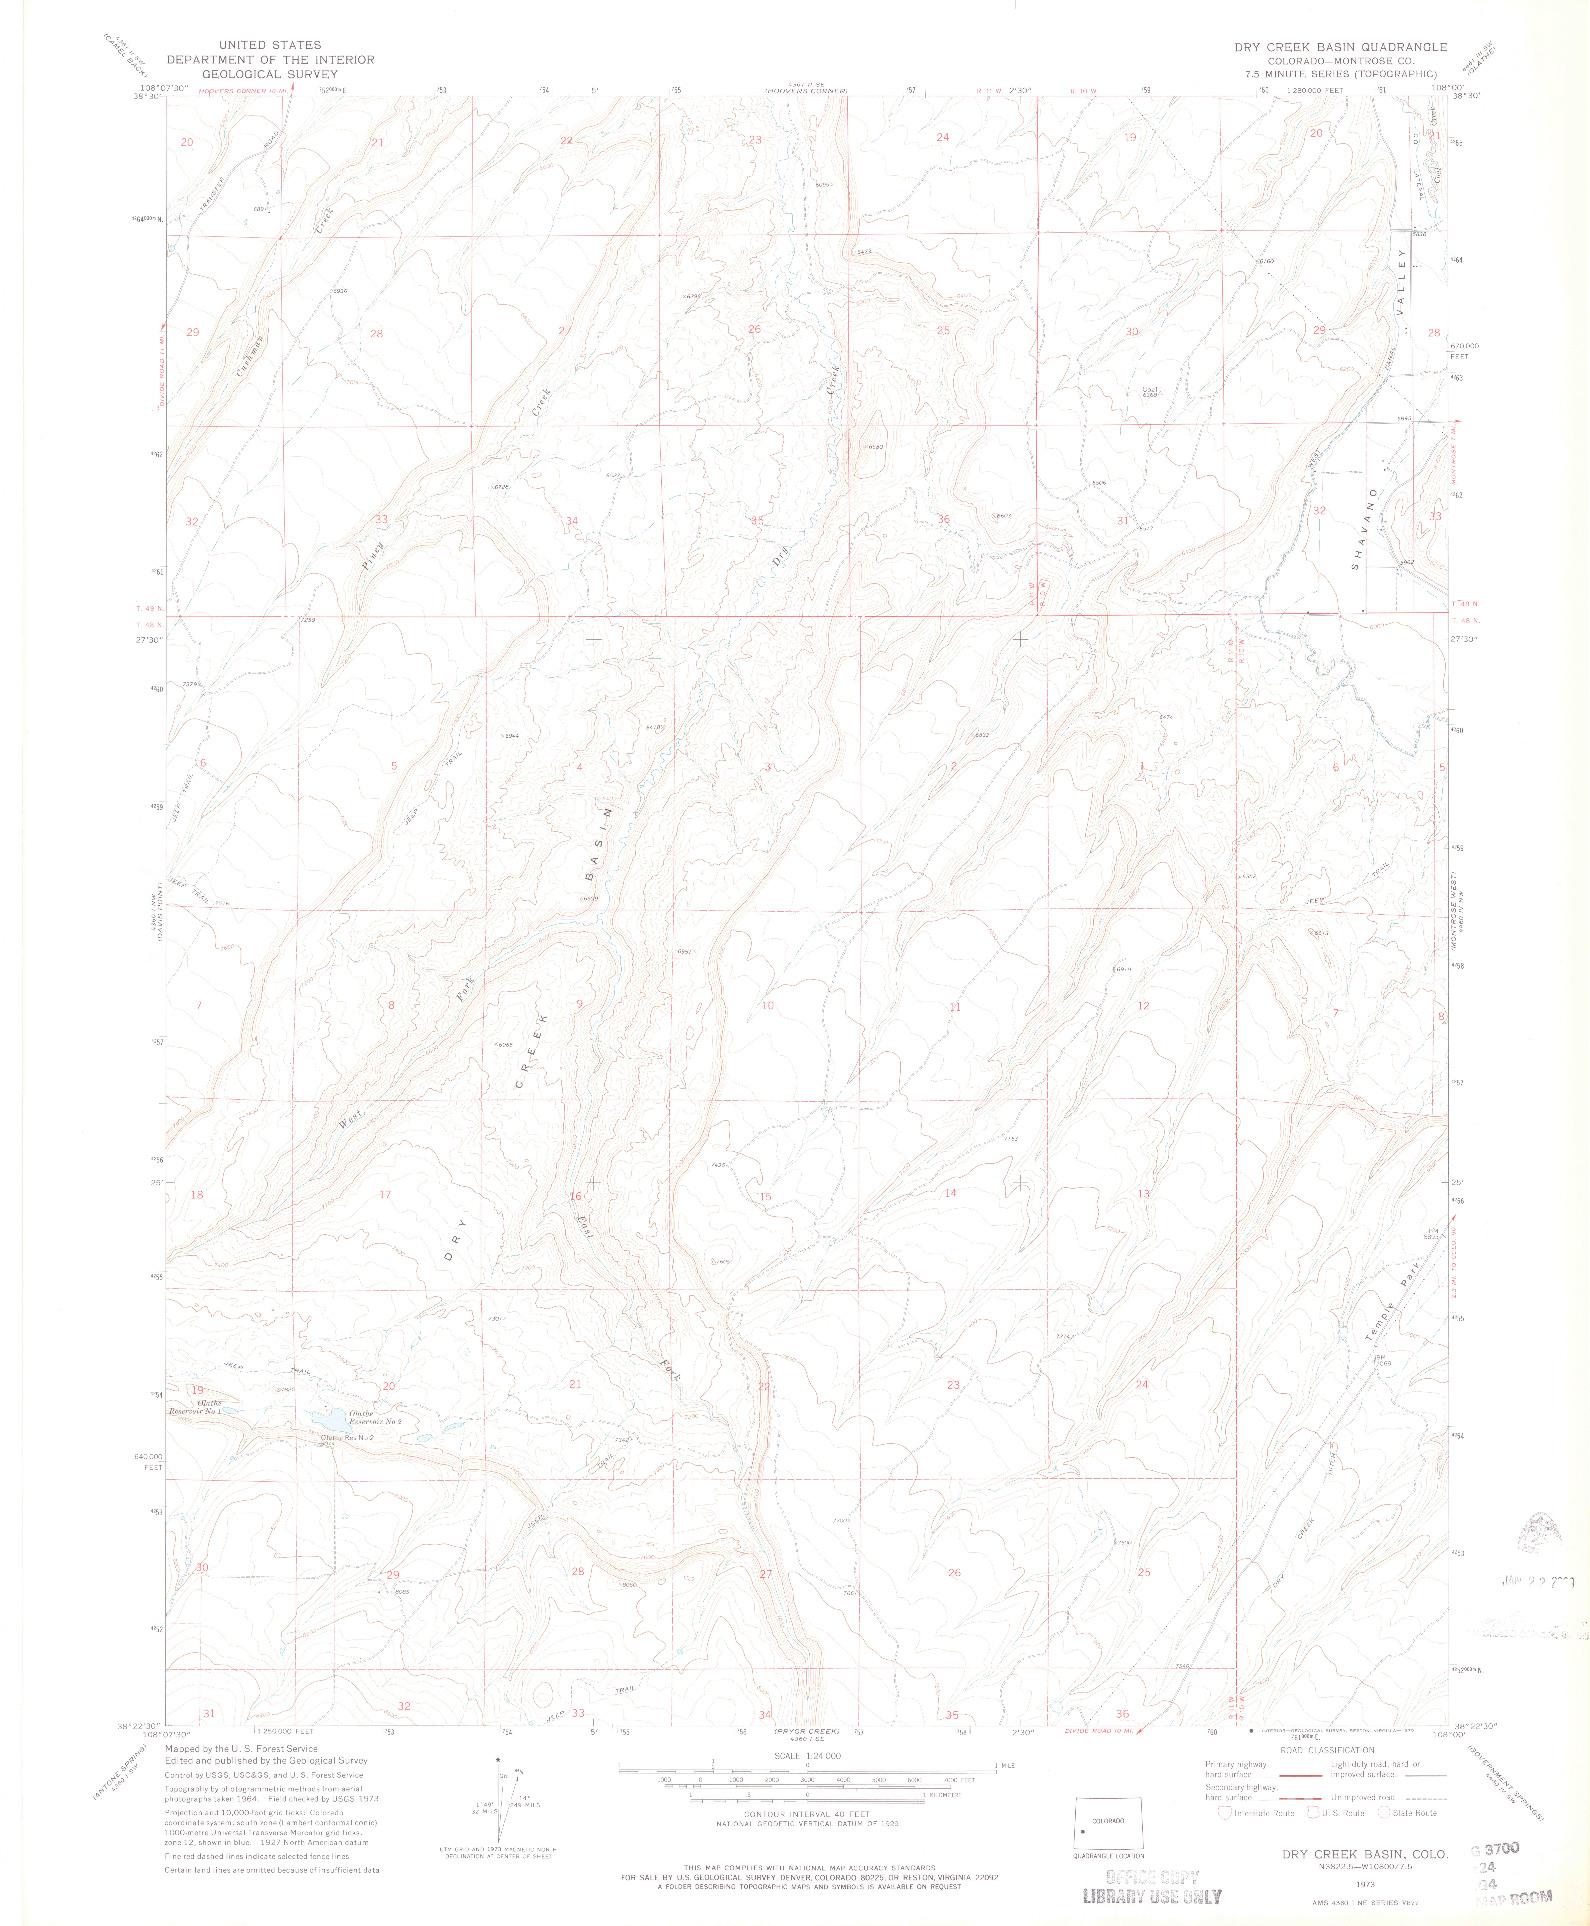 USGS 1:24000-SCALE QUADRANGLE FOR DRY CREEK BASIN, CO 1973